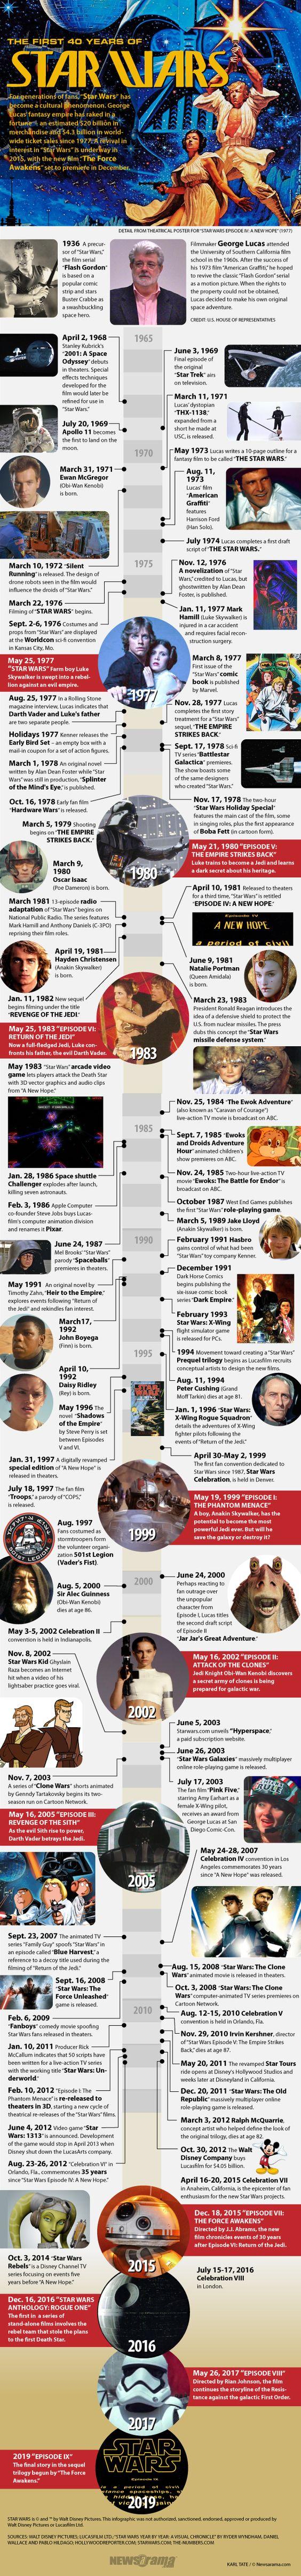 A Box Office Force Awakens: A STAR WARS Timeline (Infographic) | Newsarama.com